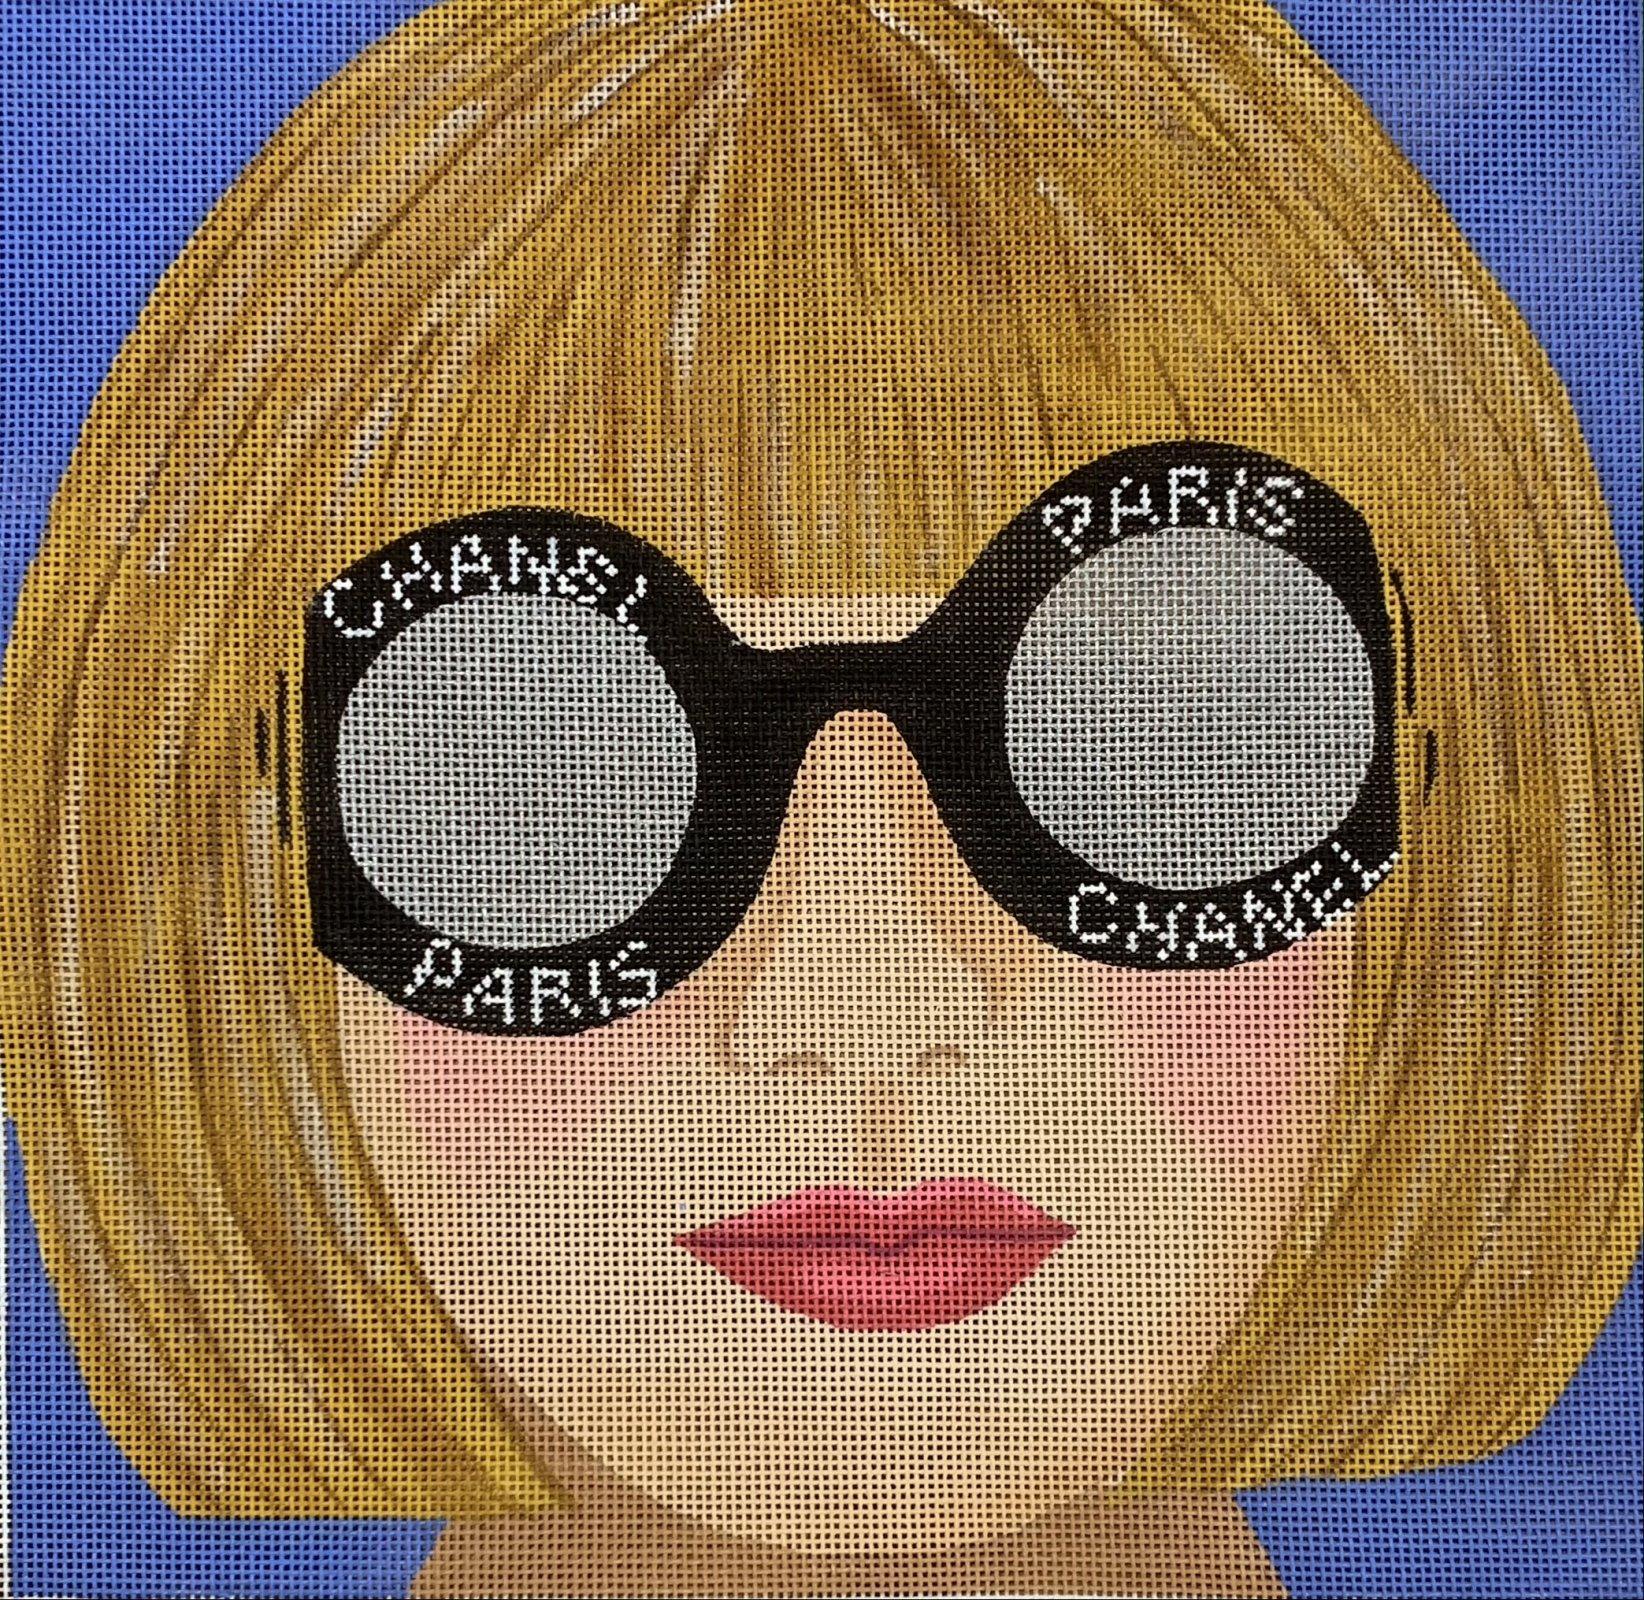 Glamourous Anna w/Chanel Signature Dark Glasses